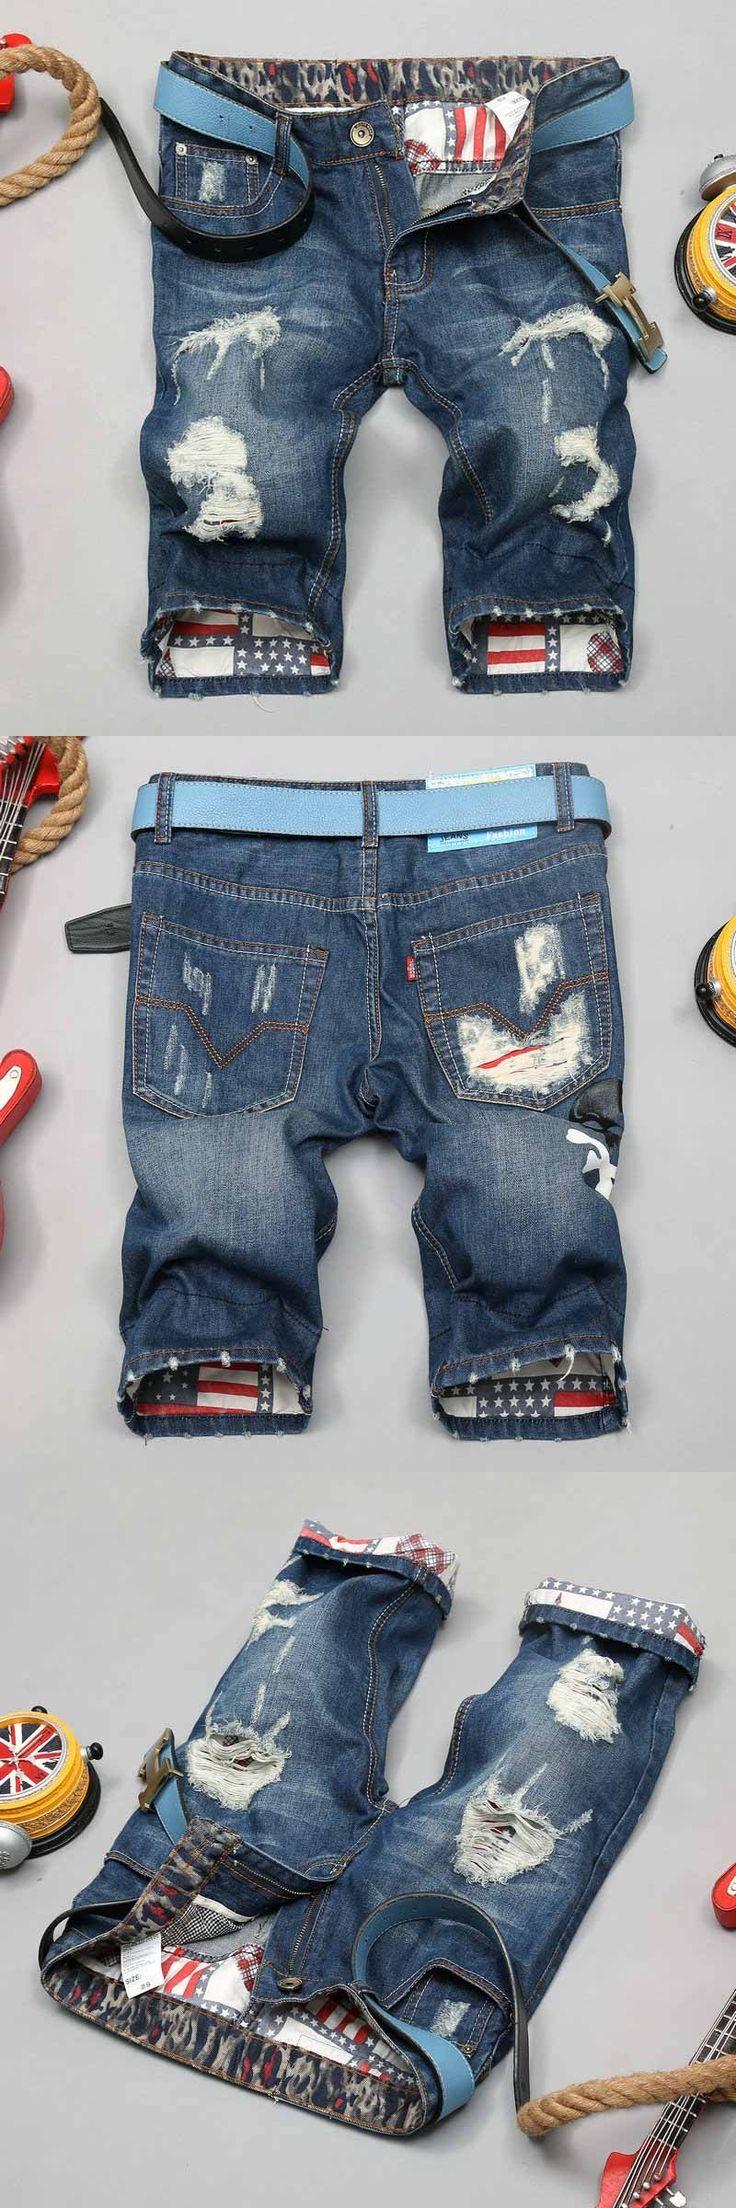 BIKER&Moto JEANS Men's Short Trousers Male Staight Jean Pants Big Boy Blue denim overalls Printing Knee Length men Jeans Ripped